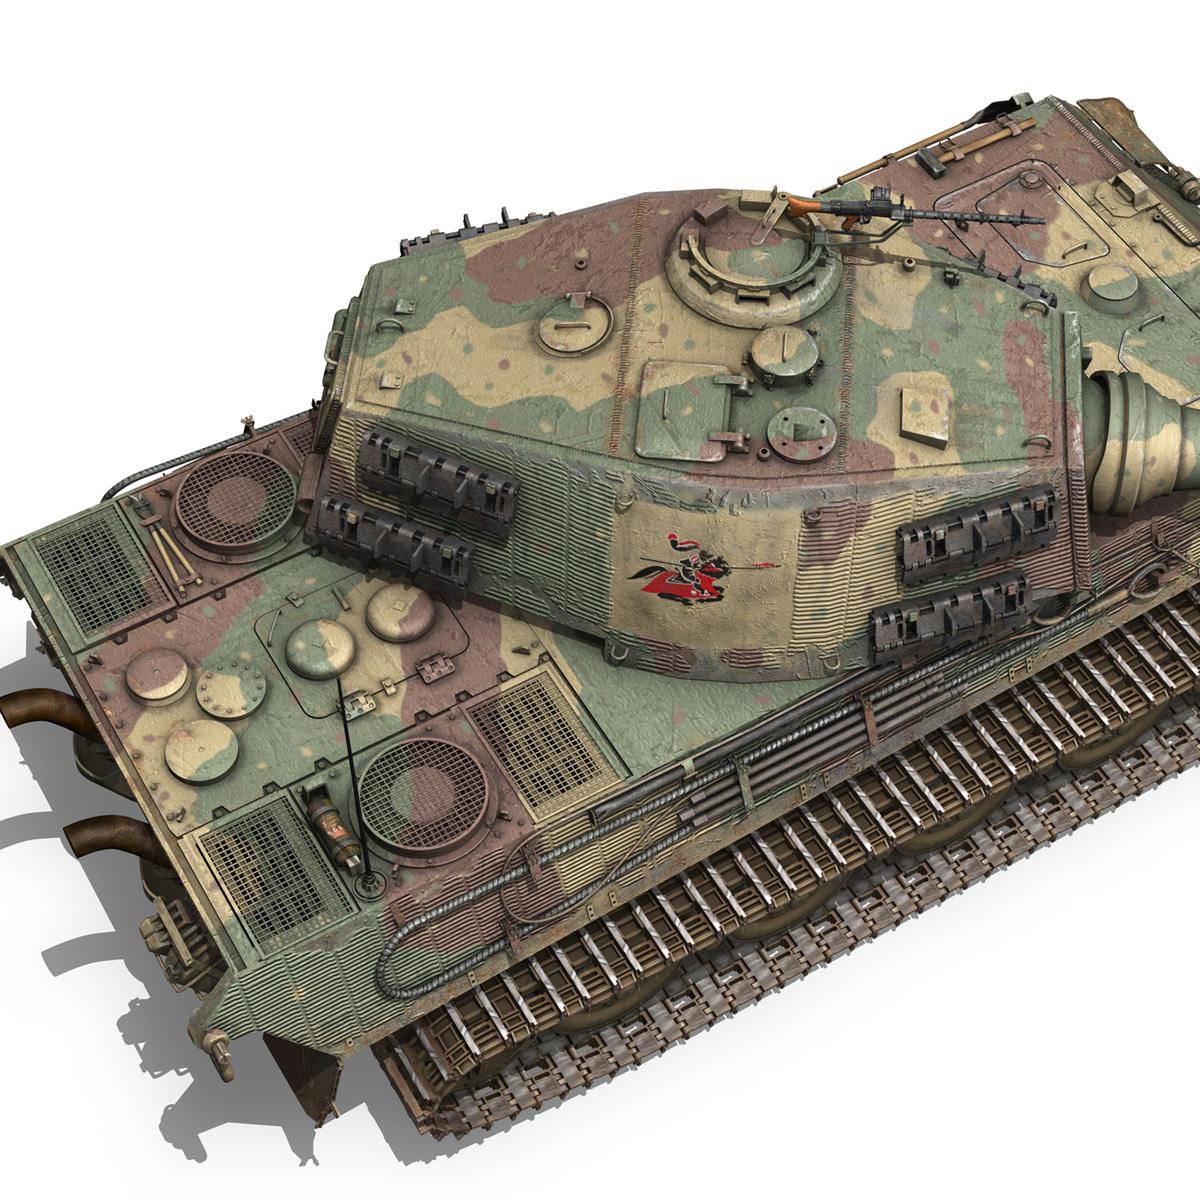 Panzerkampfwagen VI - Ausf B - Tiger II - 124 3d model 3ds c4d lwo lws lw obj 273762